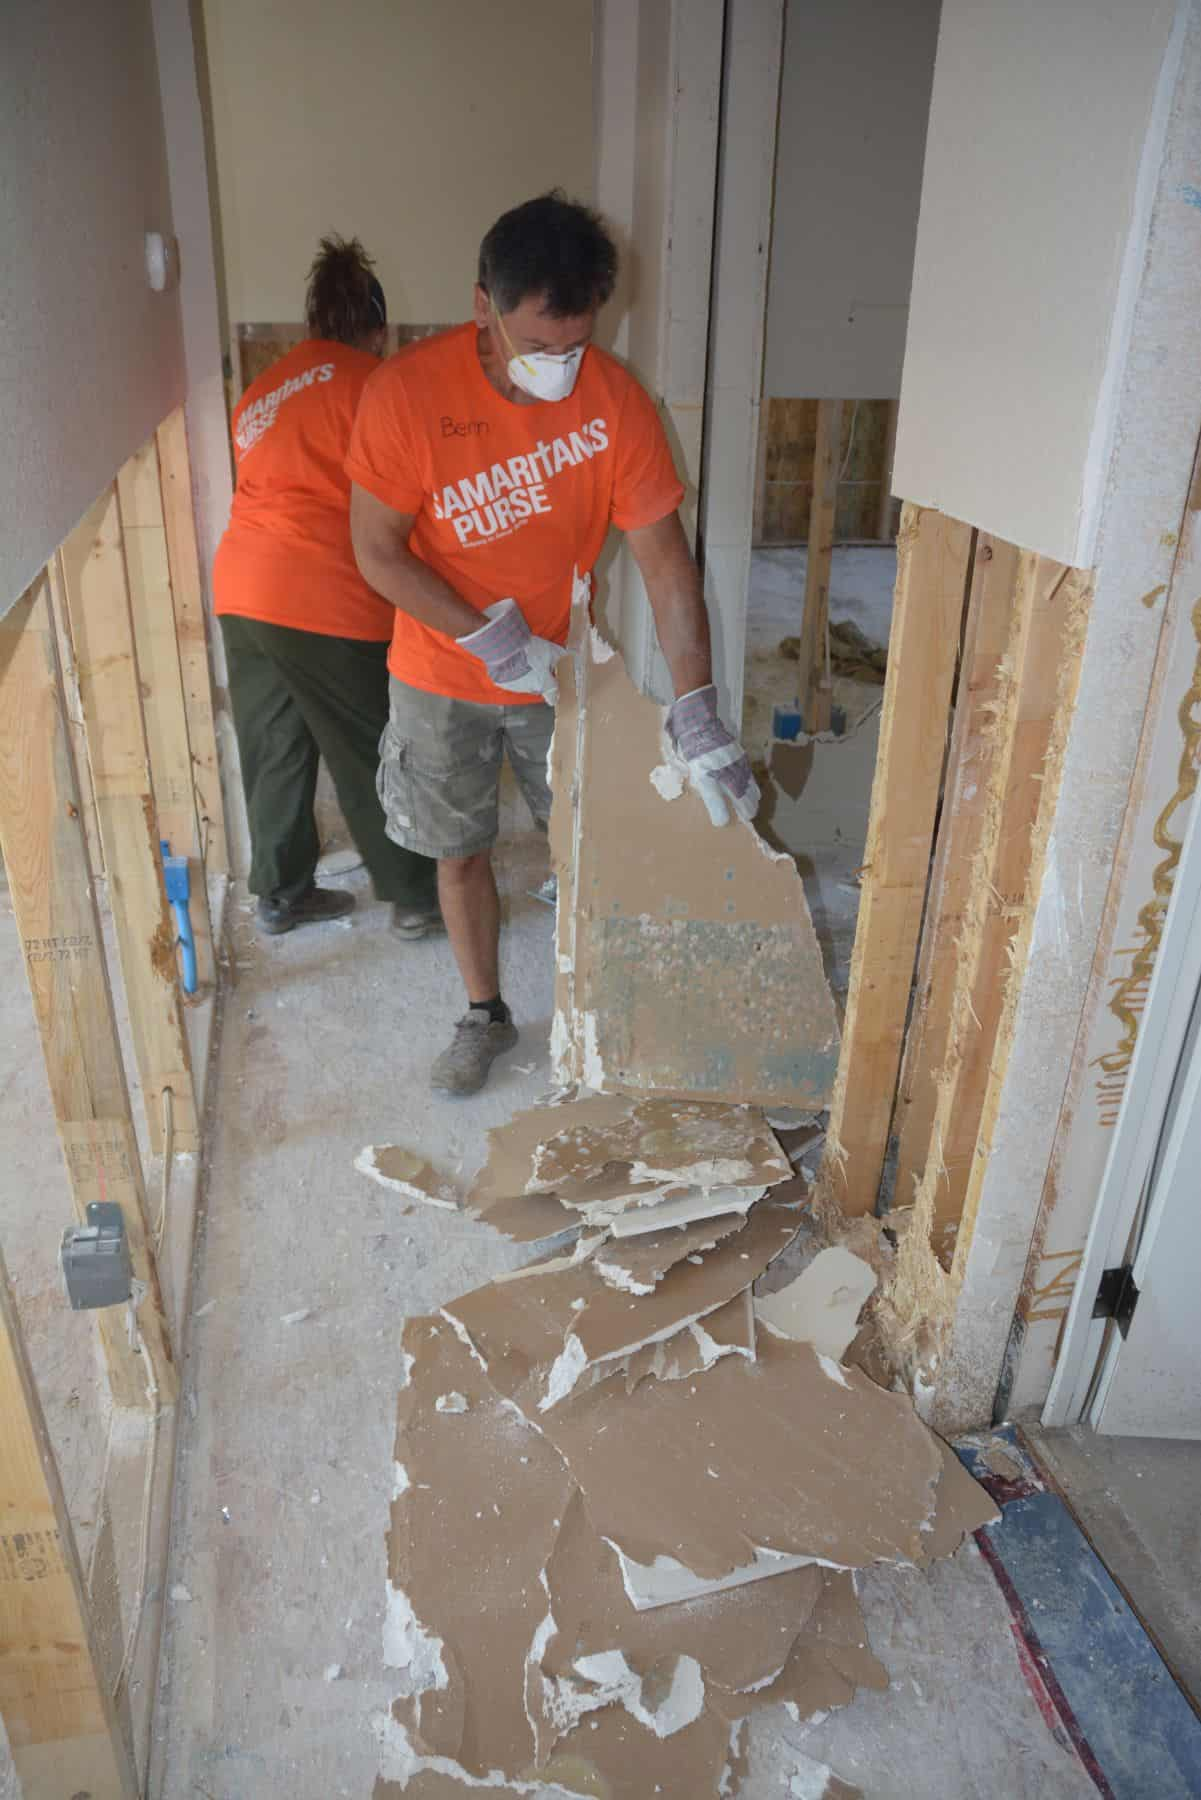 A Samaritan's Purse volunteer helps strip away moldy drywall in Grand Forks, B.C.